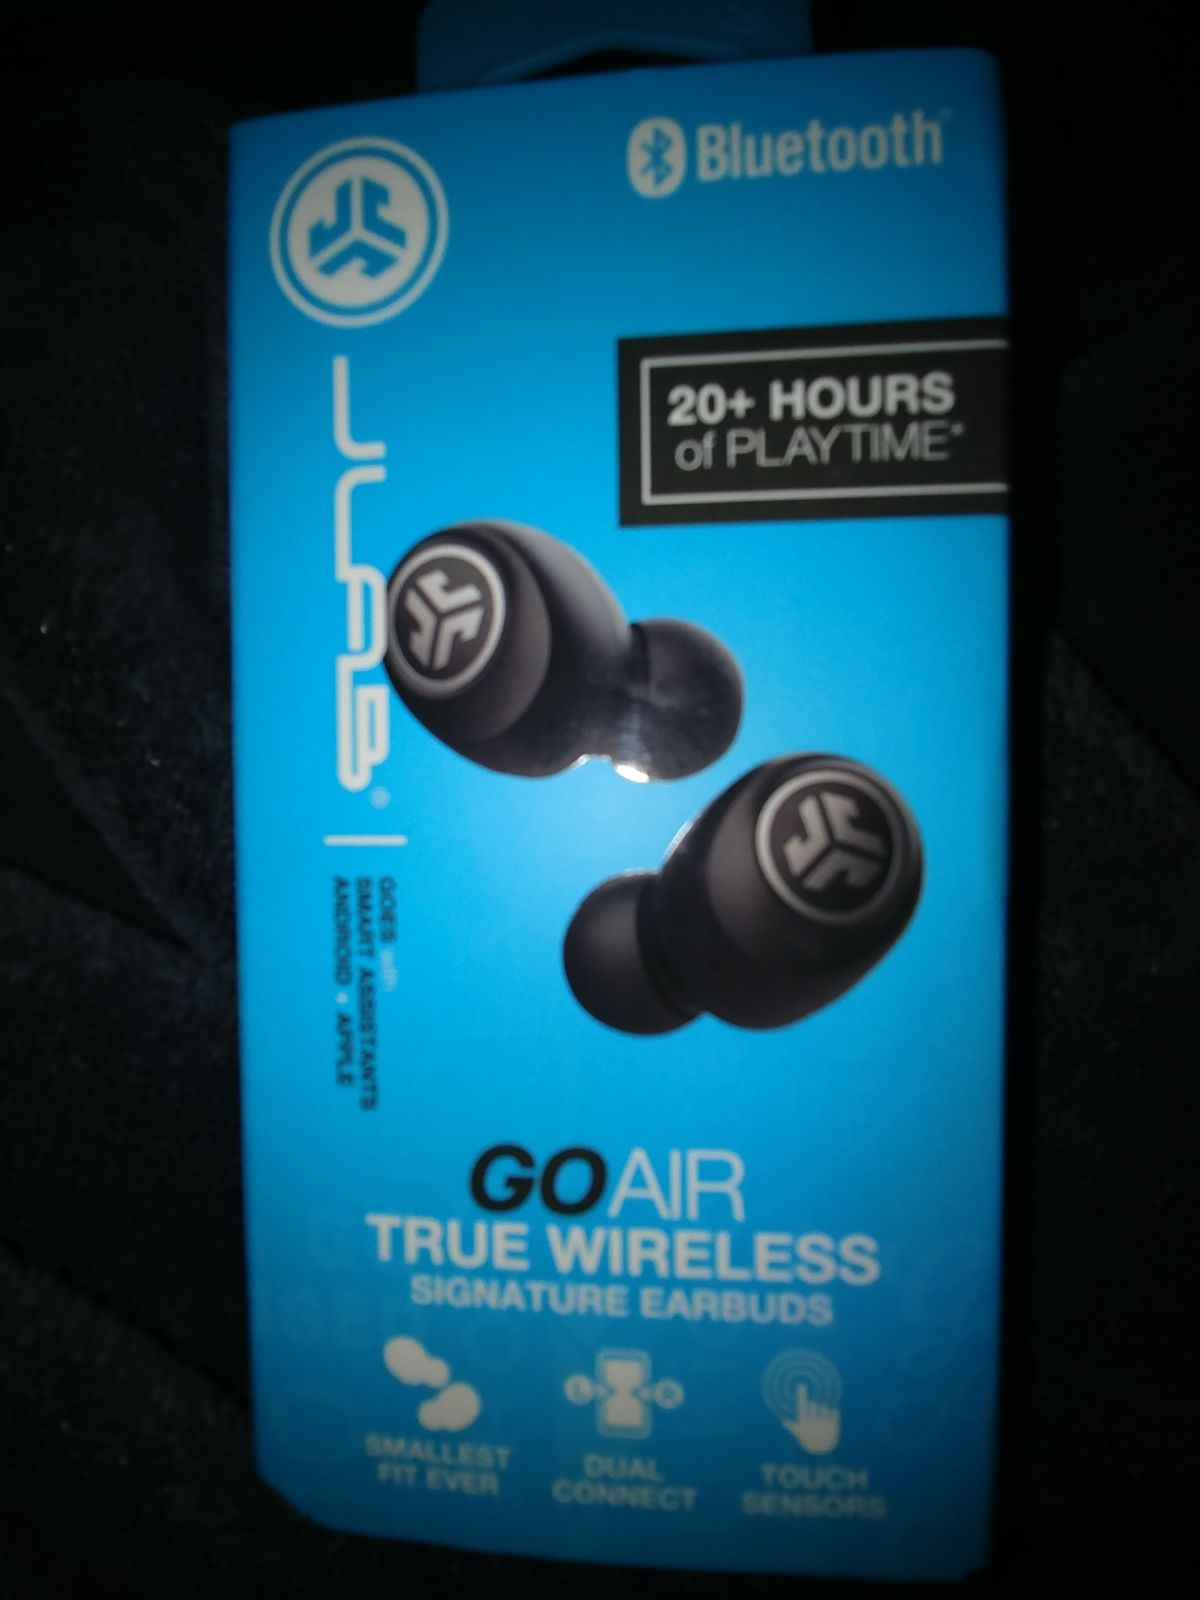 Jlab earbuds